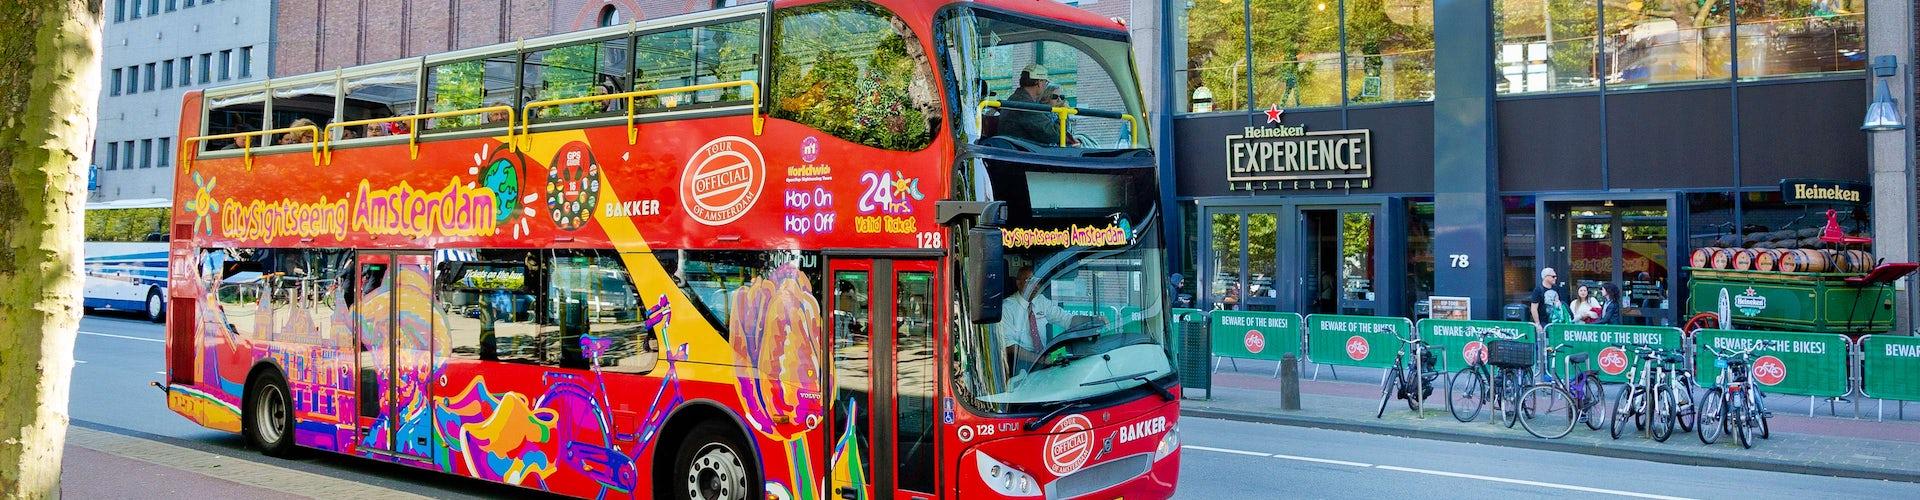 Amsterdam Bus hop on hop off